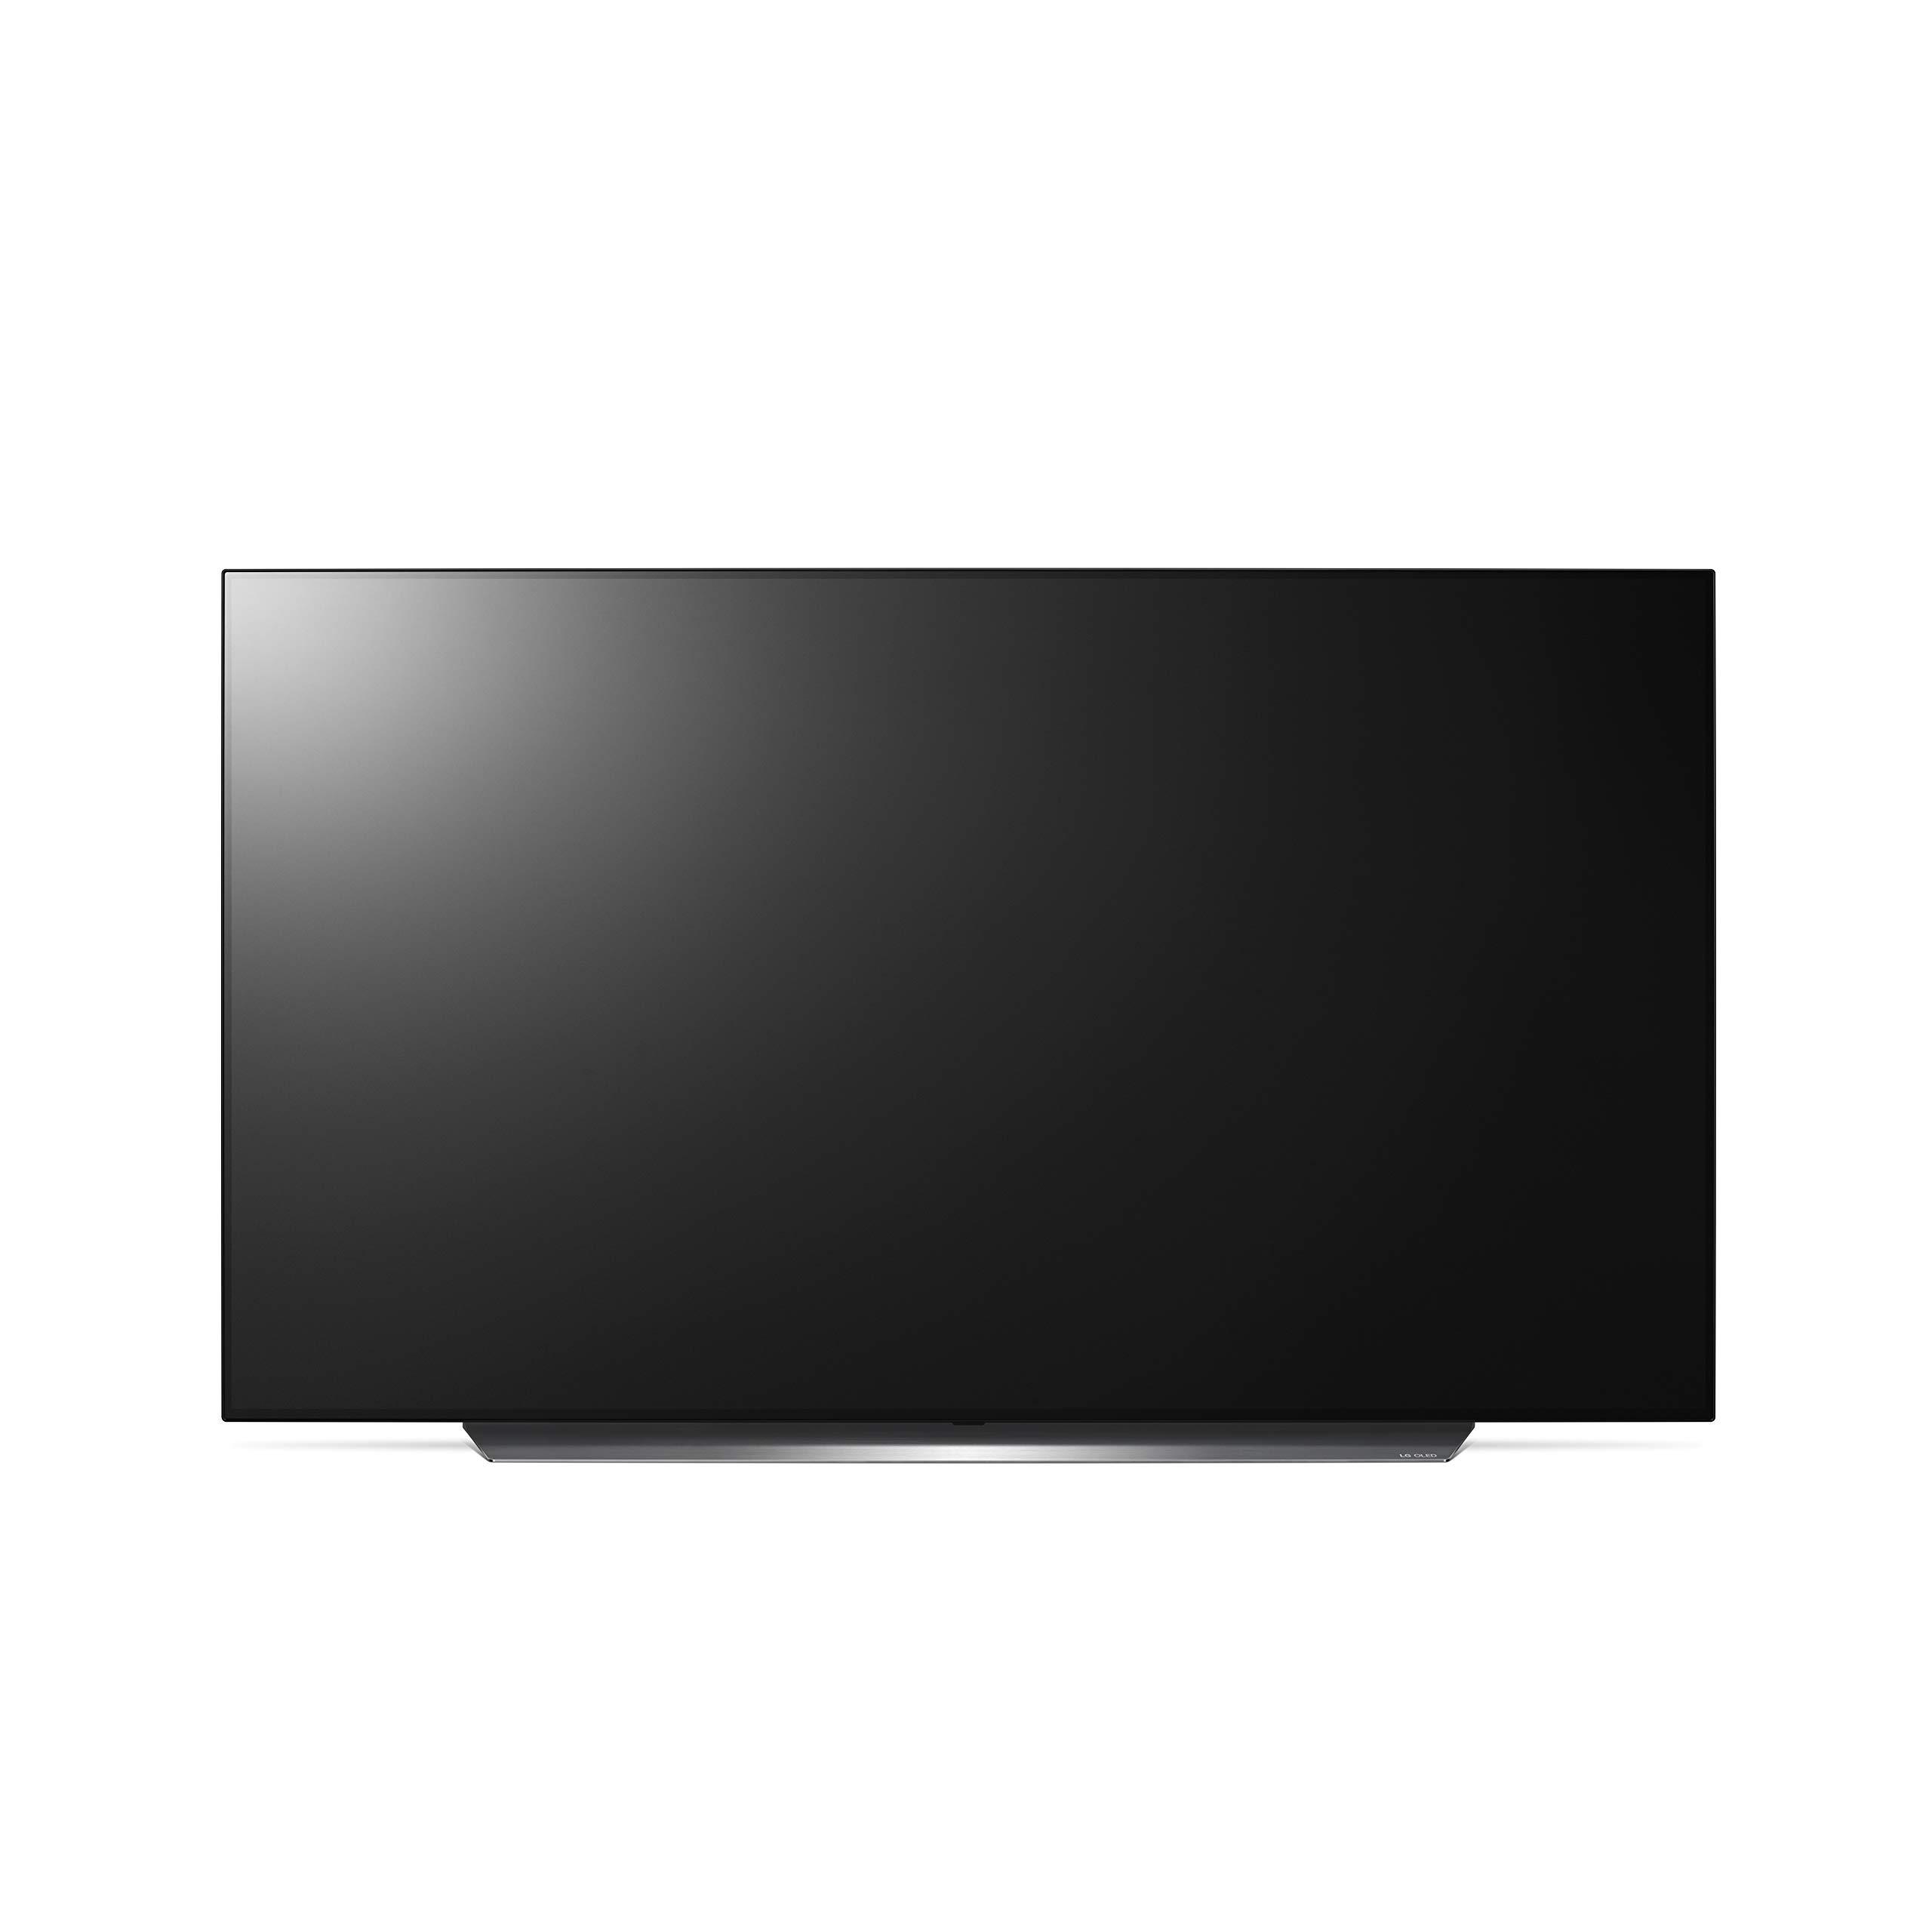 LG 55C9PLA TELEVISOR 55 OLED UHD 4K HDR THINQ Smart TV IA WEBOS 4.5 WiFi Bluetooth Sonido Dolby Atmos: Lg: Amazon.es: Electrónica